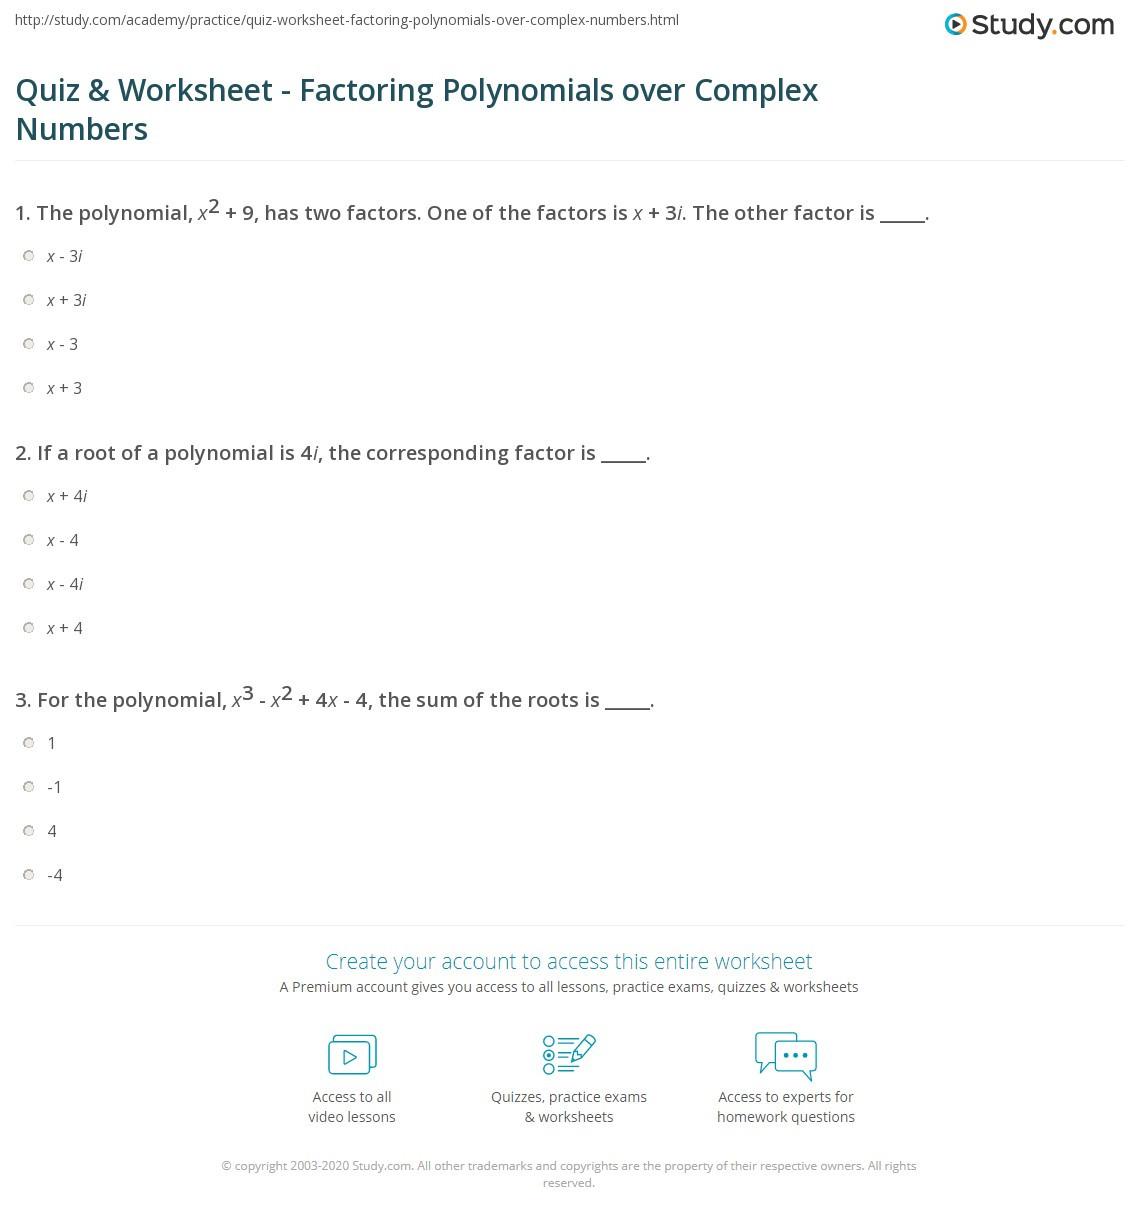 Factoring Practice Worksheet Answers